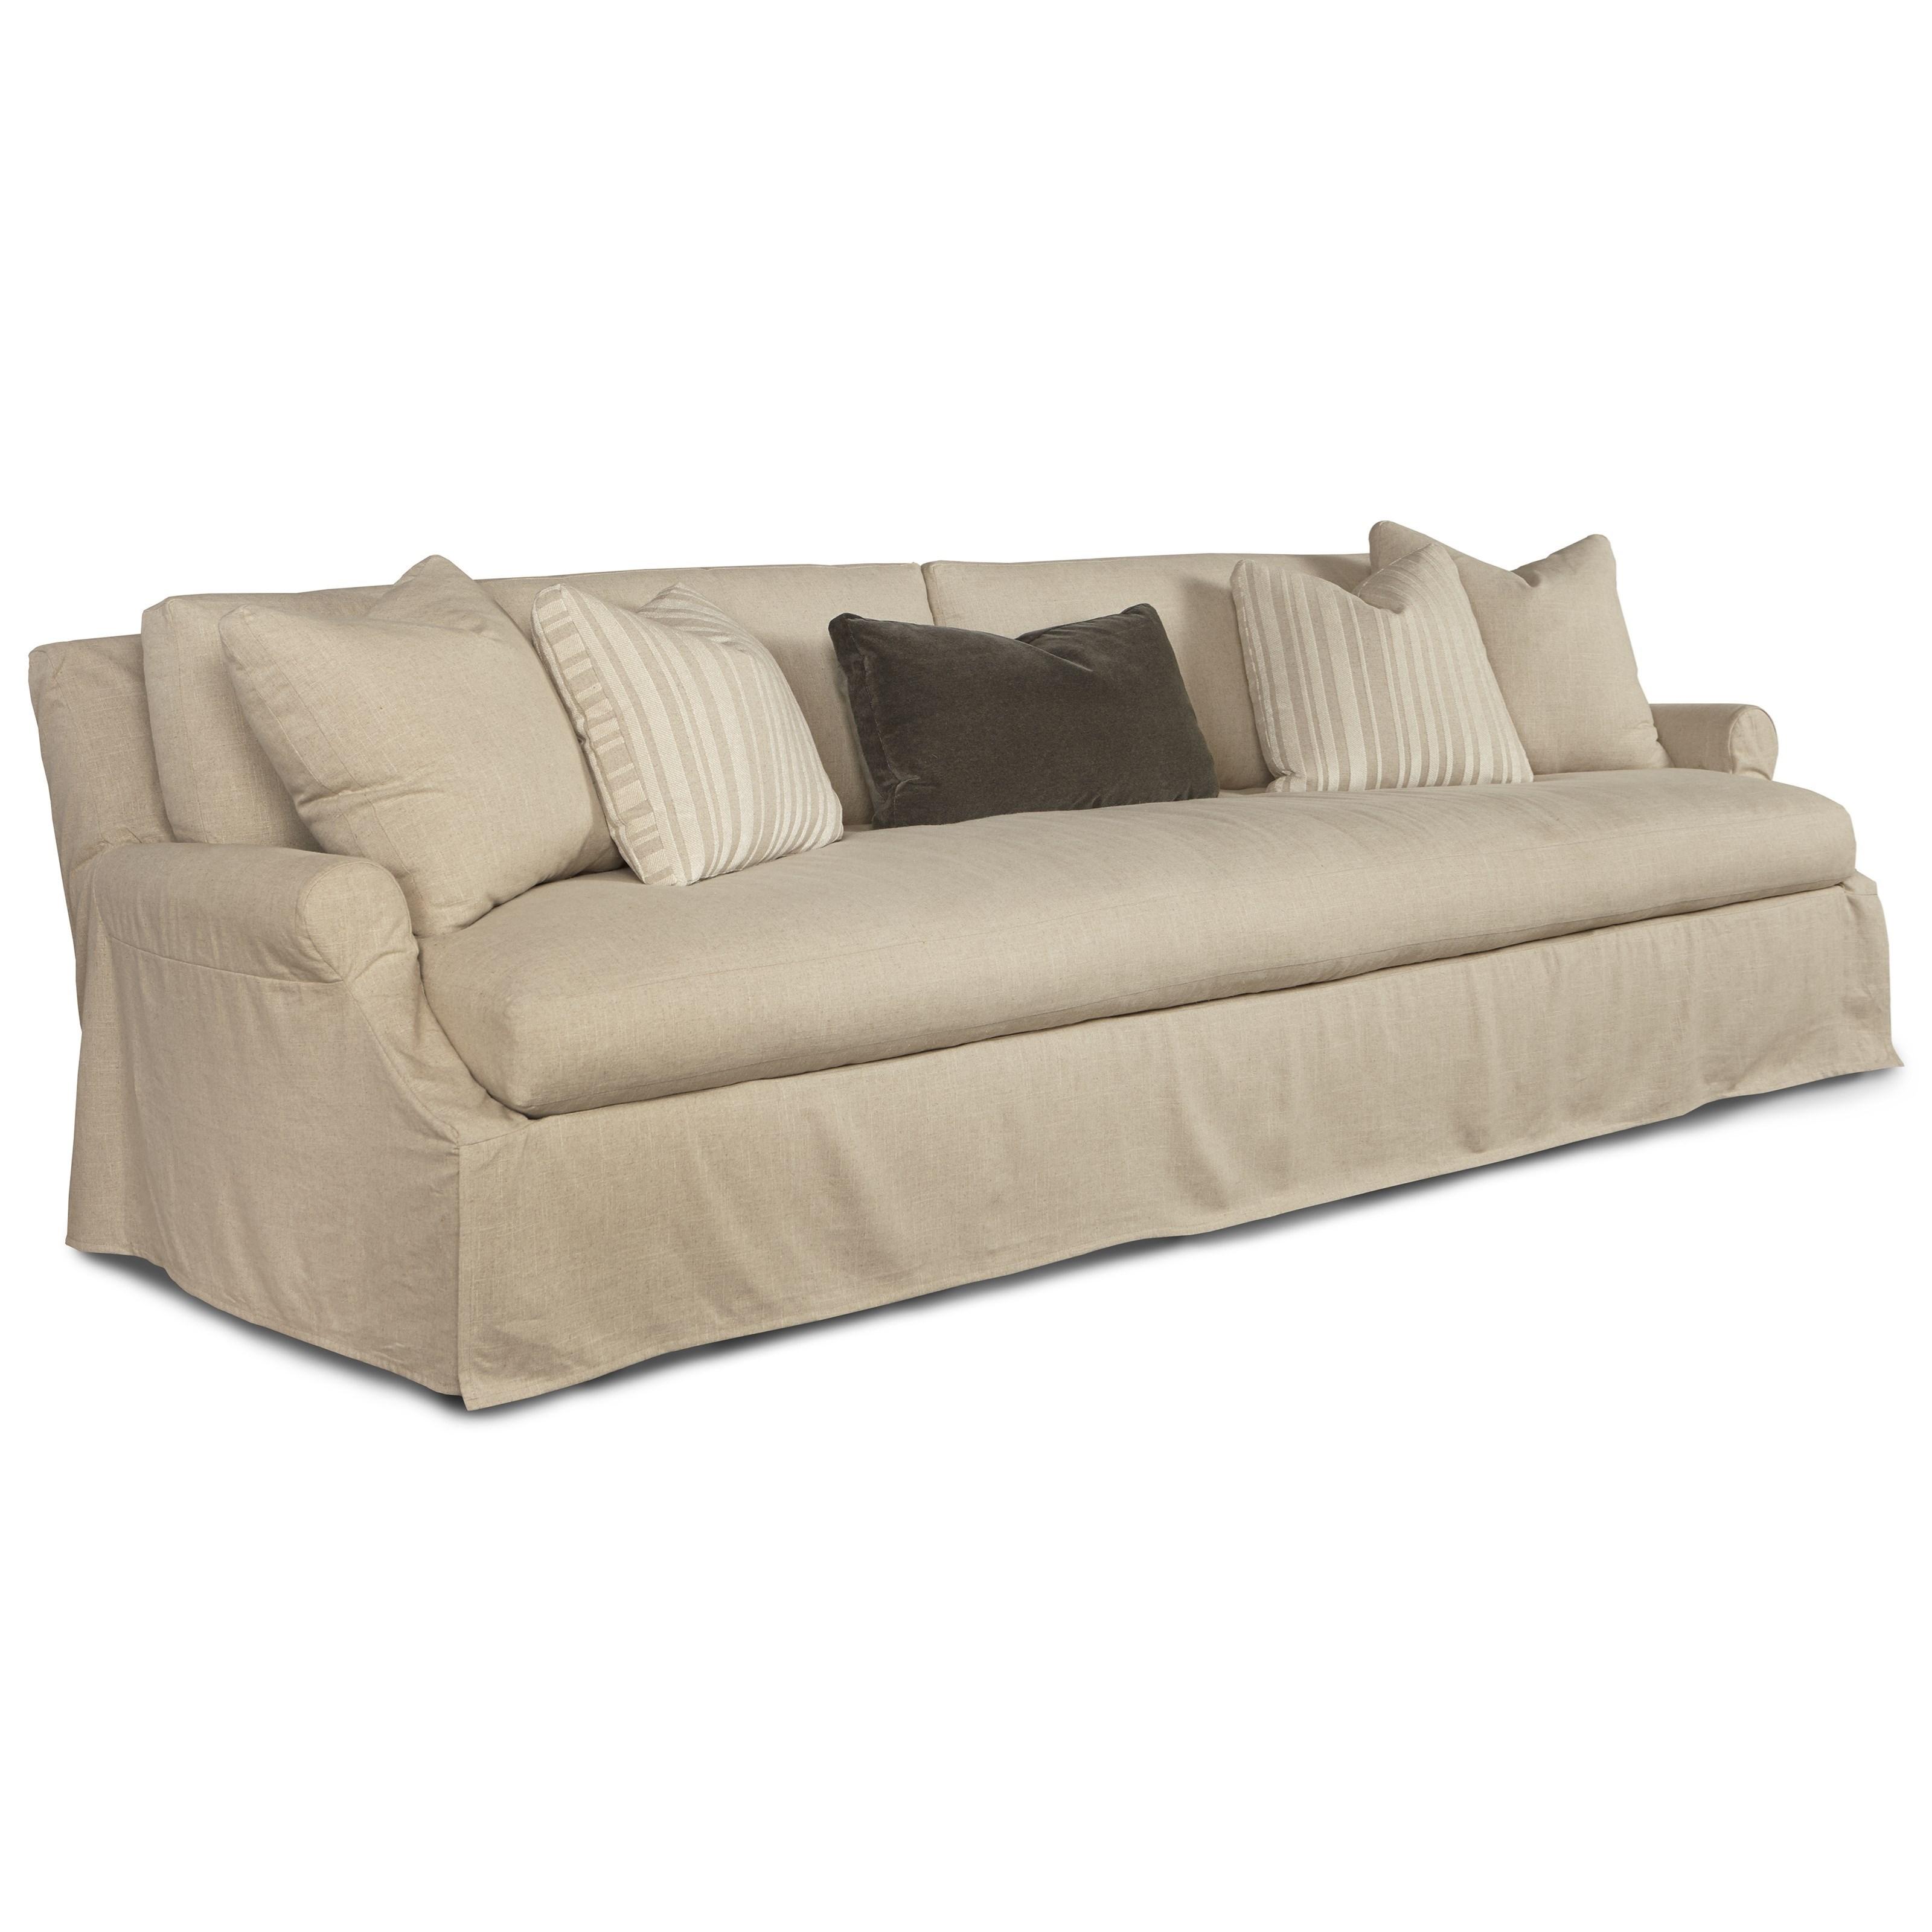 robin bruce bristol bristol 033 110 inch bench seat cushion rh beckerfurnitureworld com sofa with attached seat cushions sofa seat cushion foam